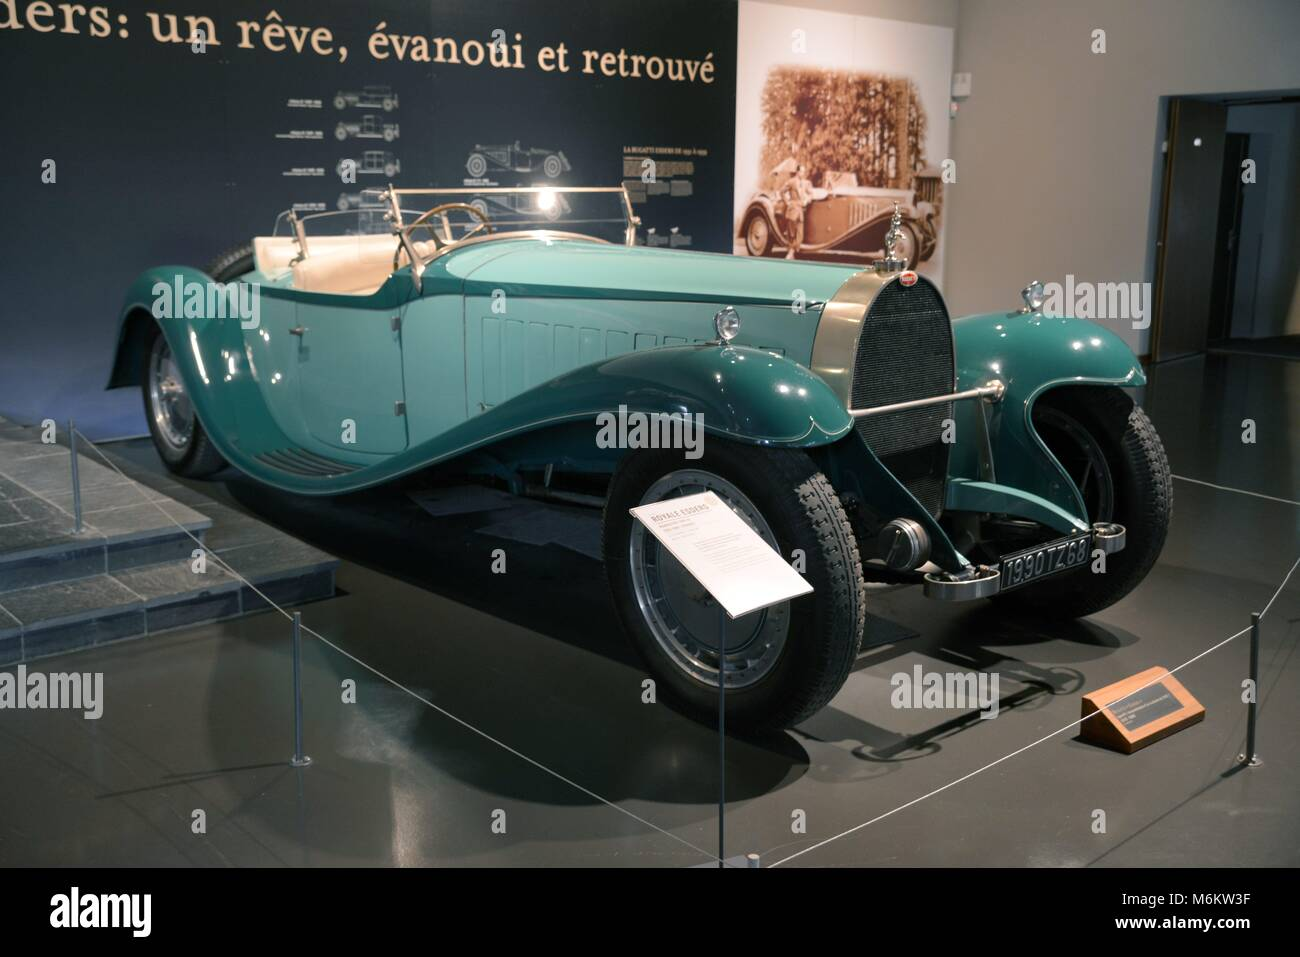 bugatti royale stock photos & bugatti royale stock images - alamy